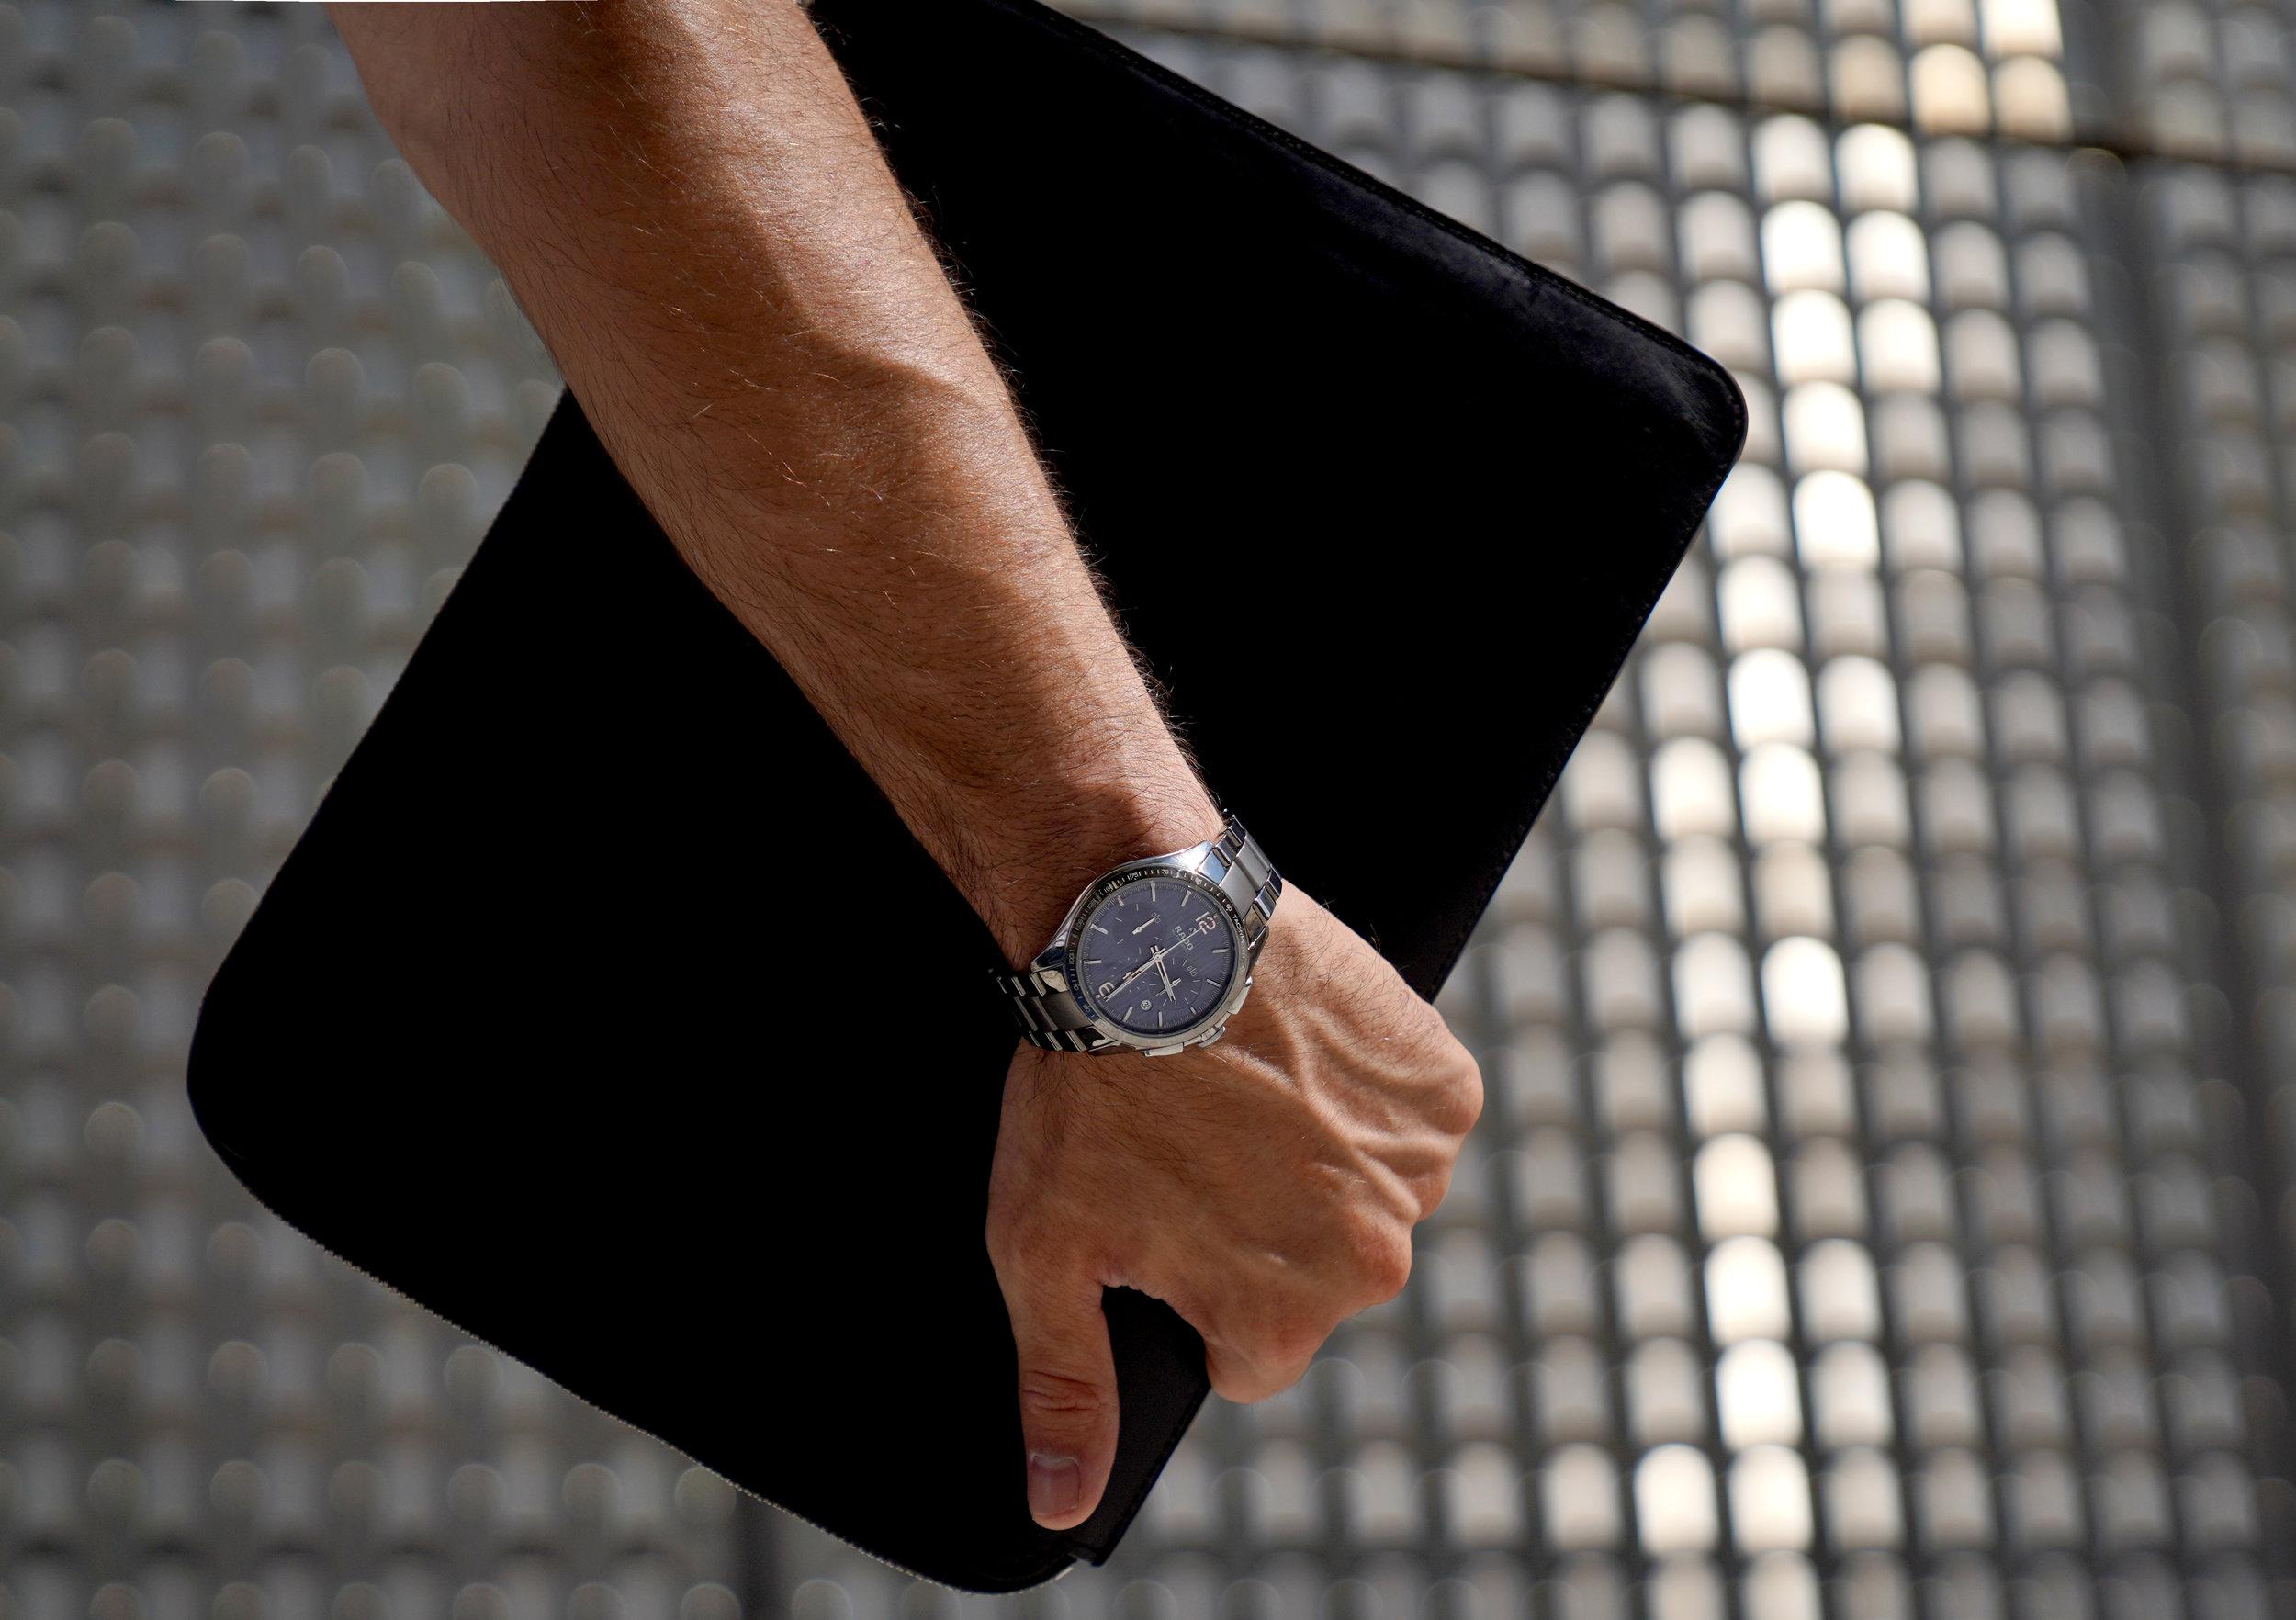 Watch: Rado HyperChrome Automatic Chronograph